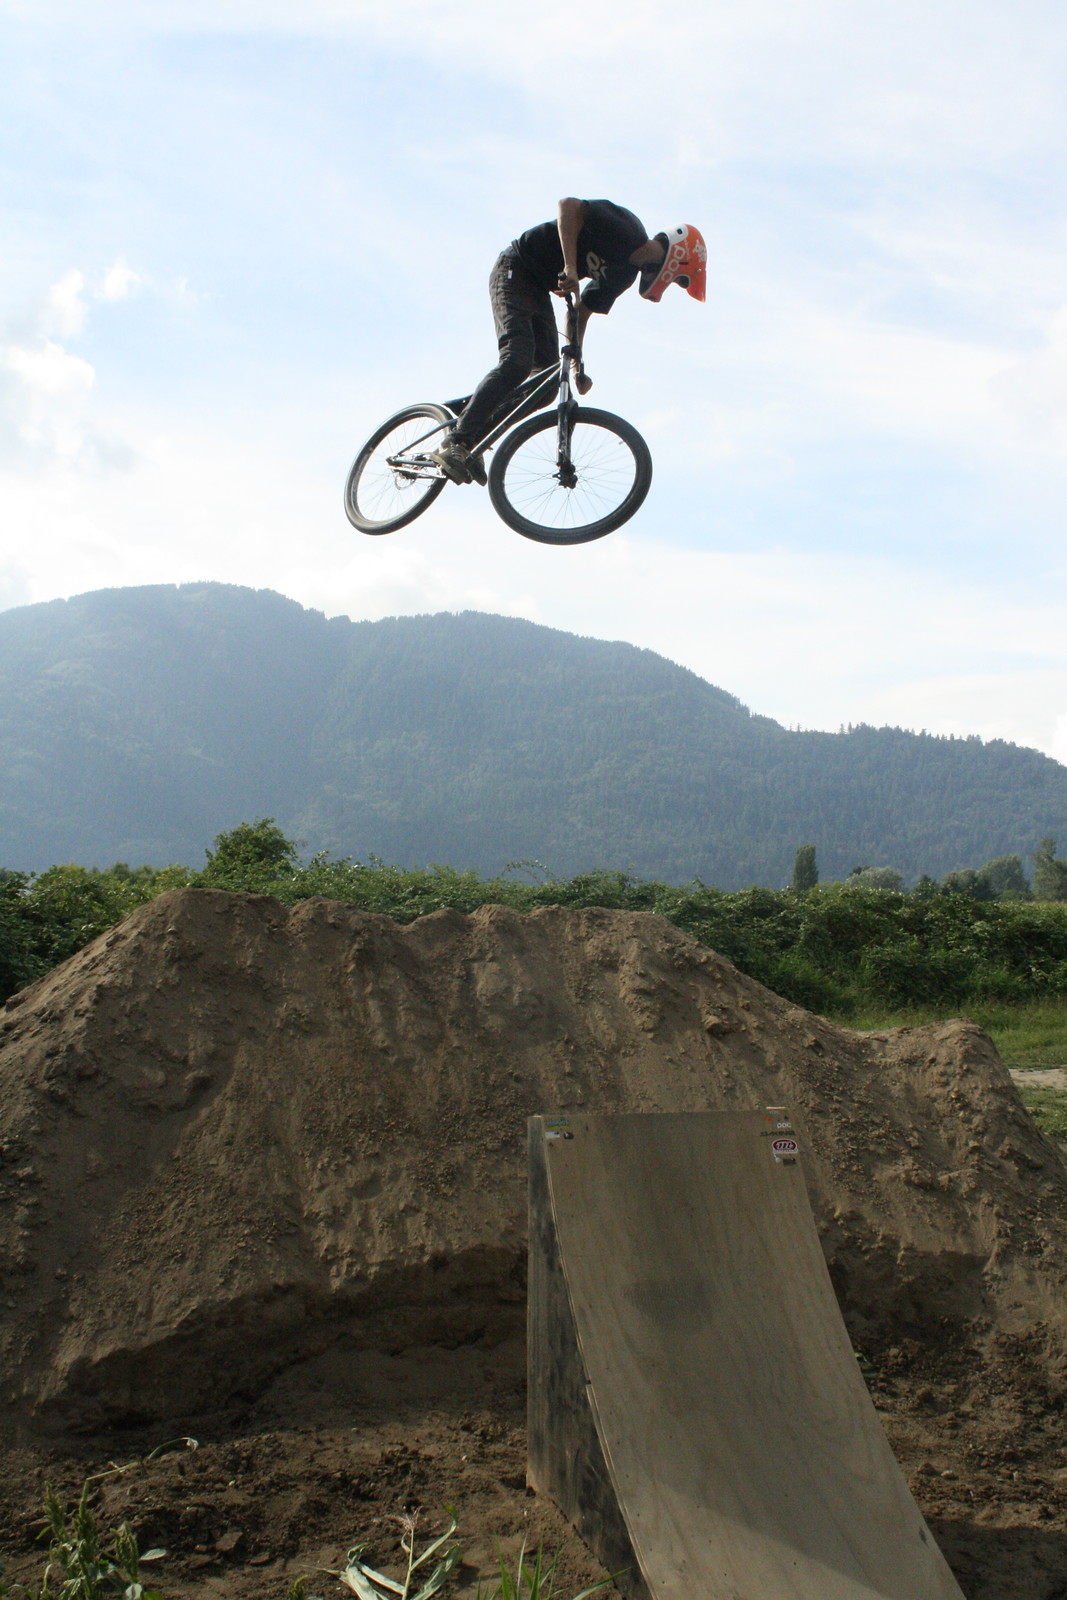 IMG_3231 - samhein - Mountain Biking Pictures - Vital MTB